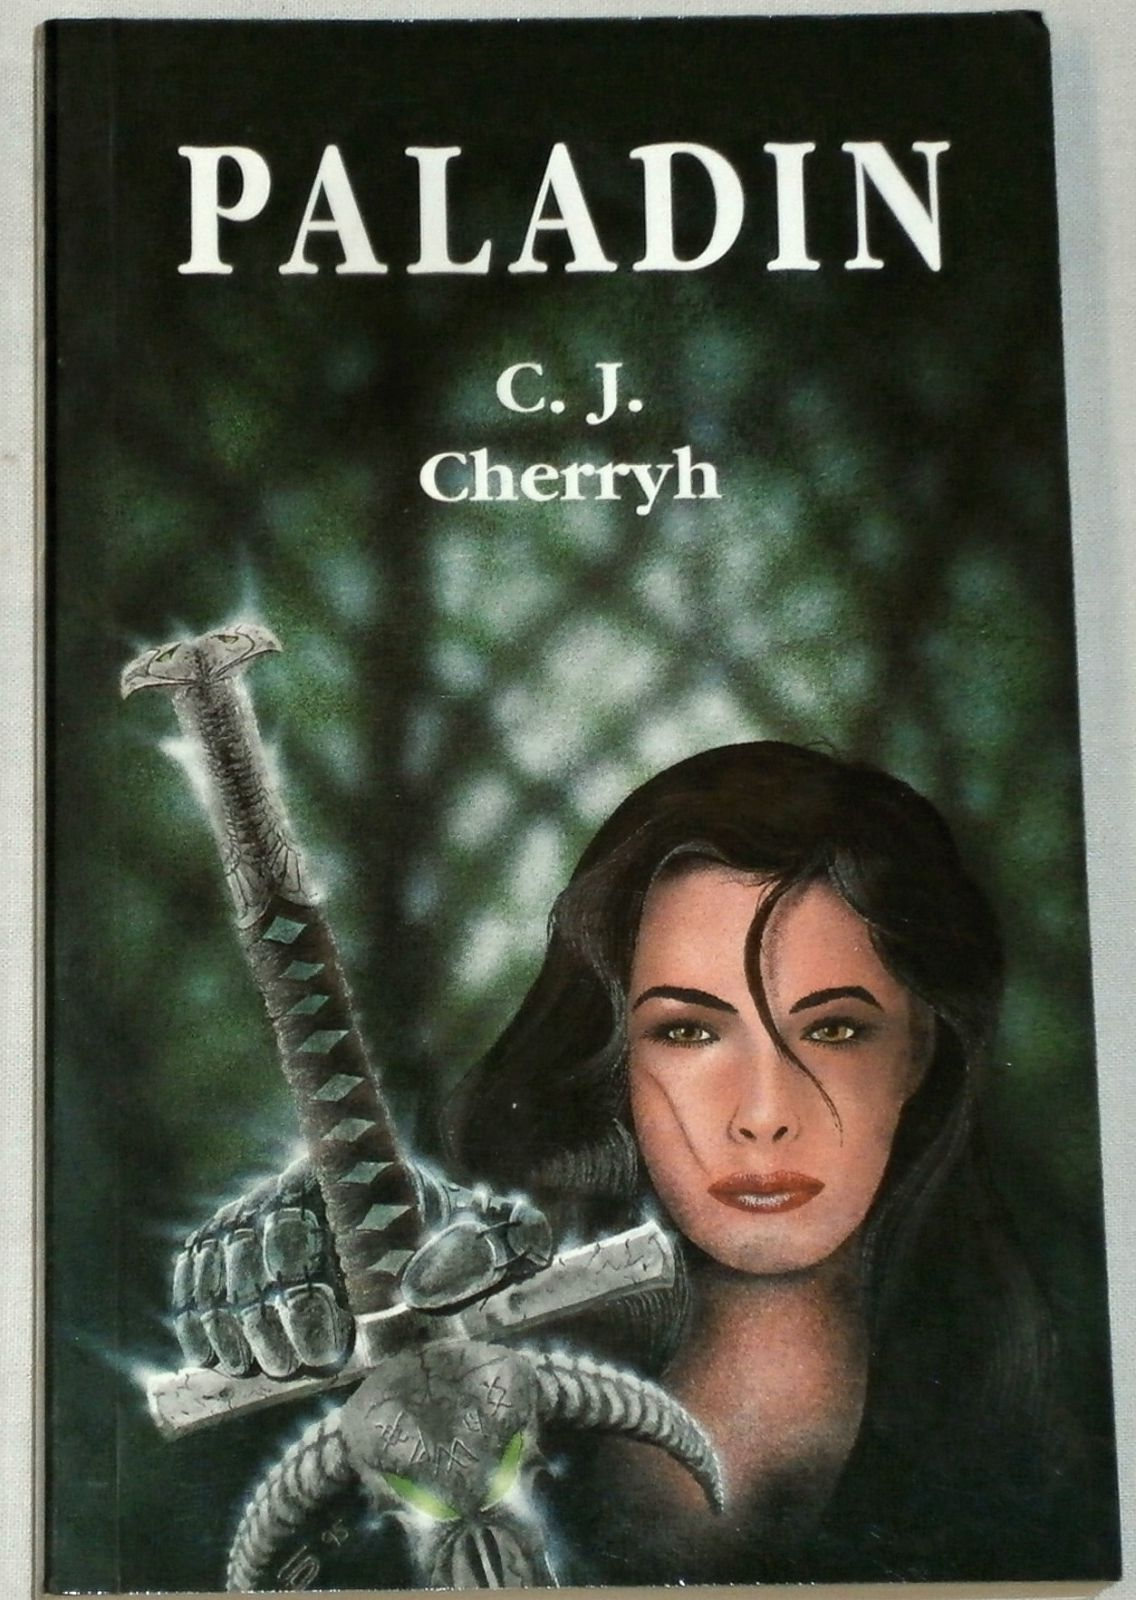 Cherryh C. J. - Paladin